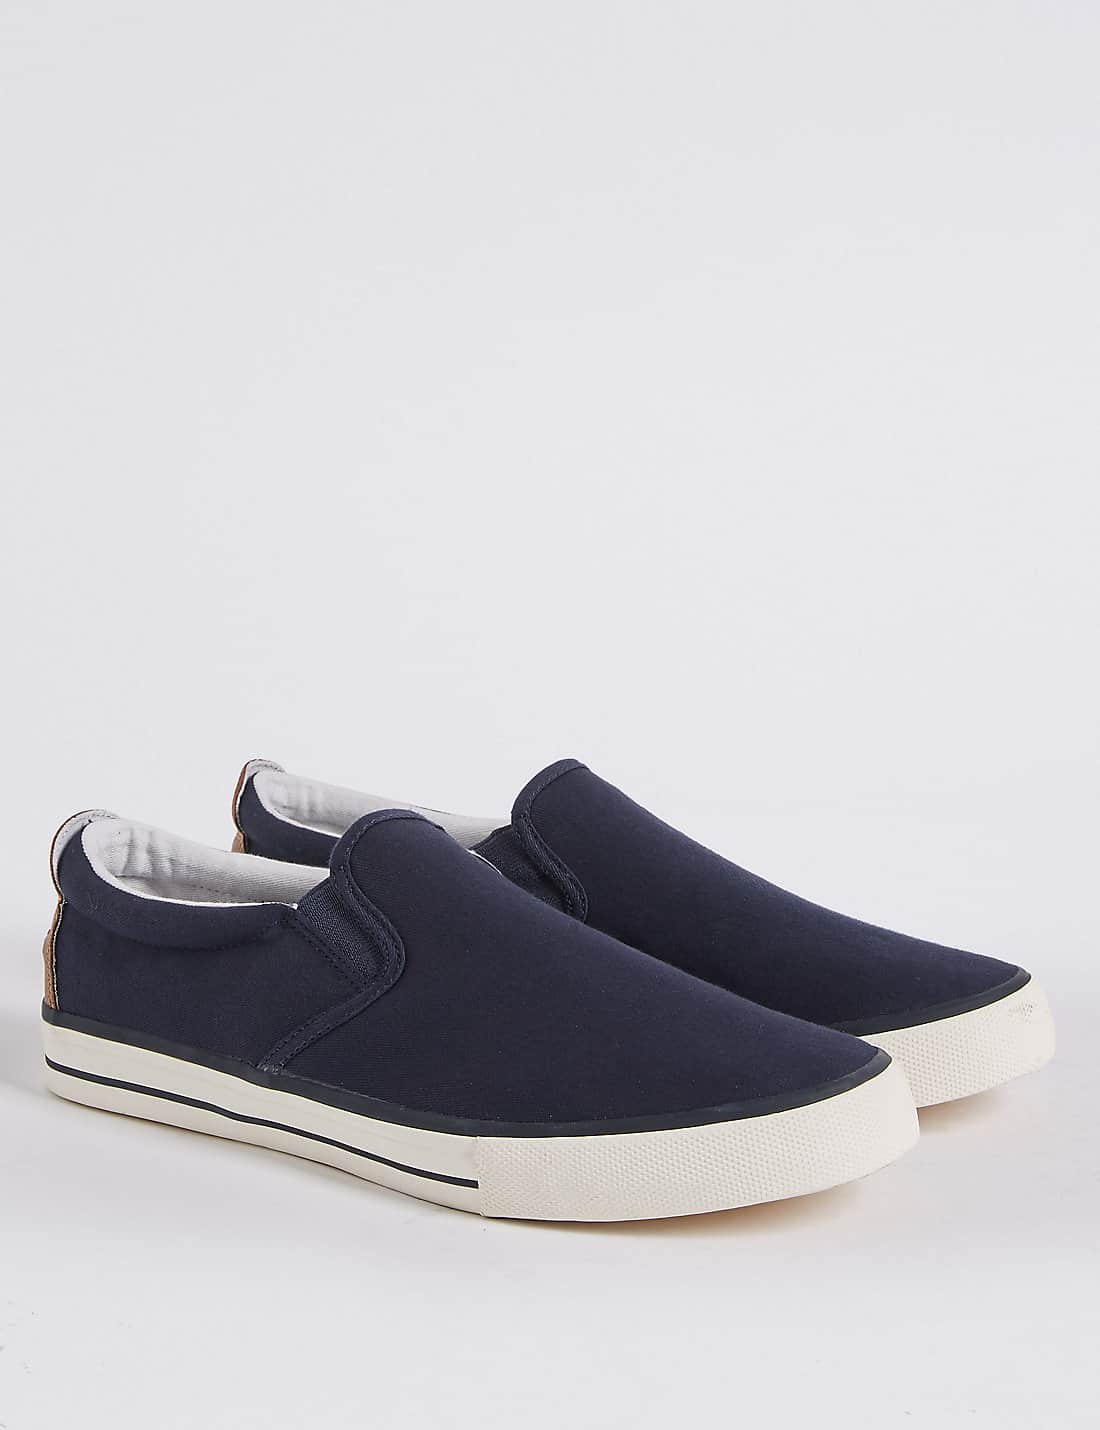 M\u0026S Mens shoes - Mell Square Shopping